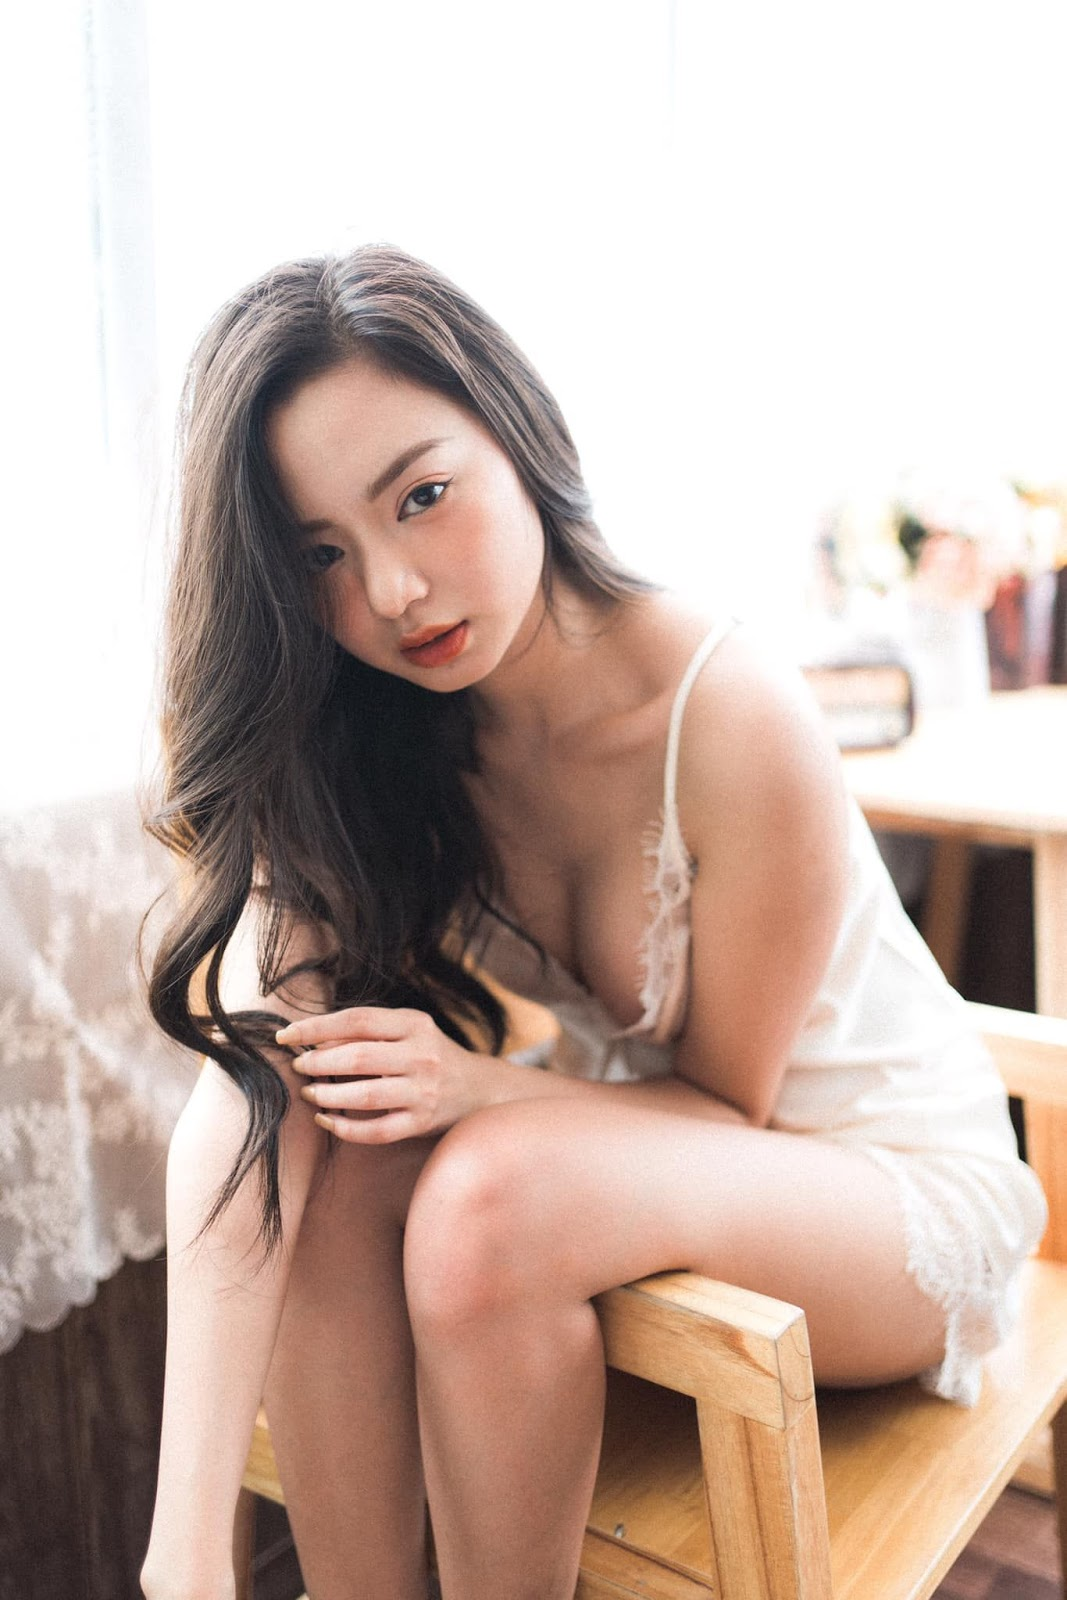 Vietnamese Sexy Model - Vu Ngoc Kim Chi - Beautiful in white - TruePic.net- Picture 23